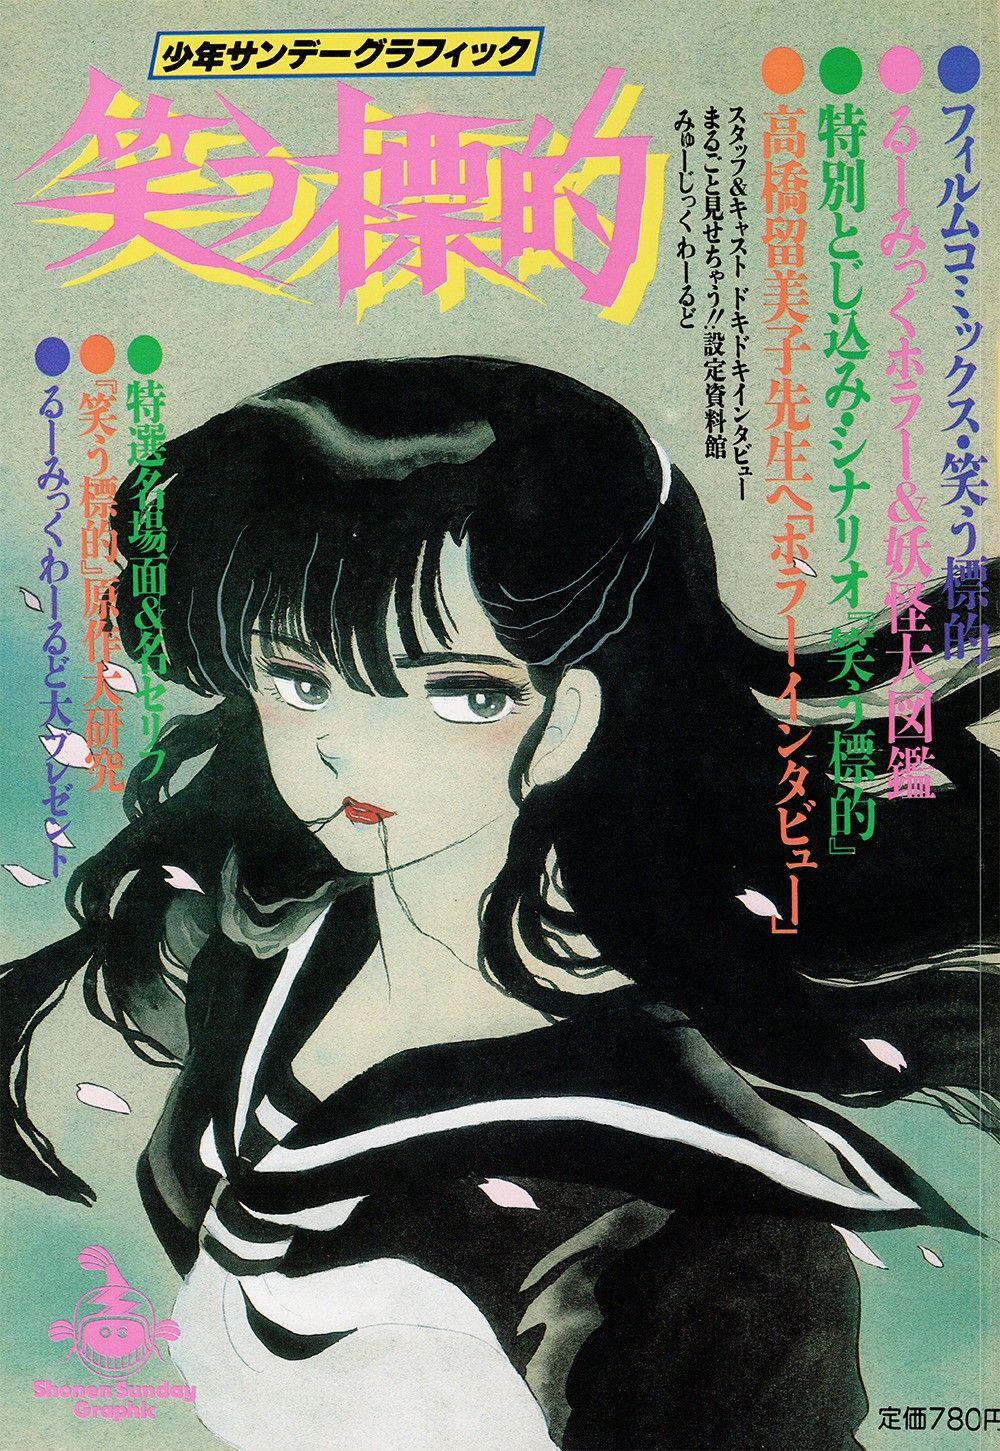 Pin By Nurma Eko On Manga Anime Artists Anime Wall Art Aesthetic Anime Japanese Graphic Design